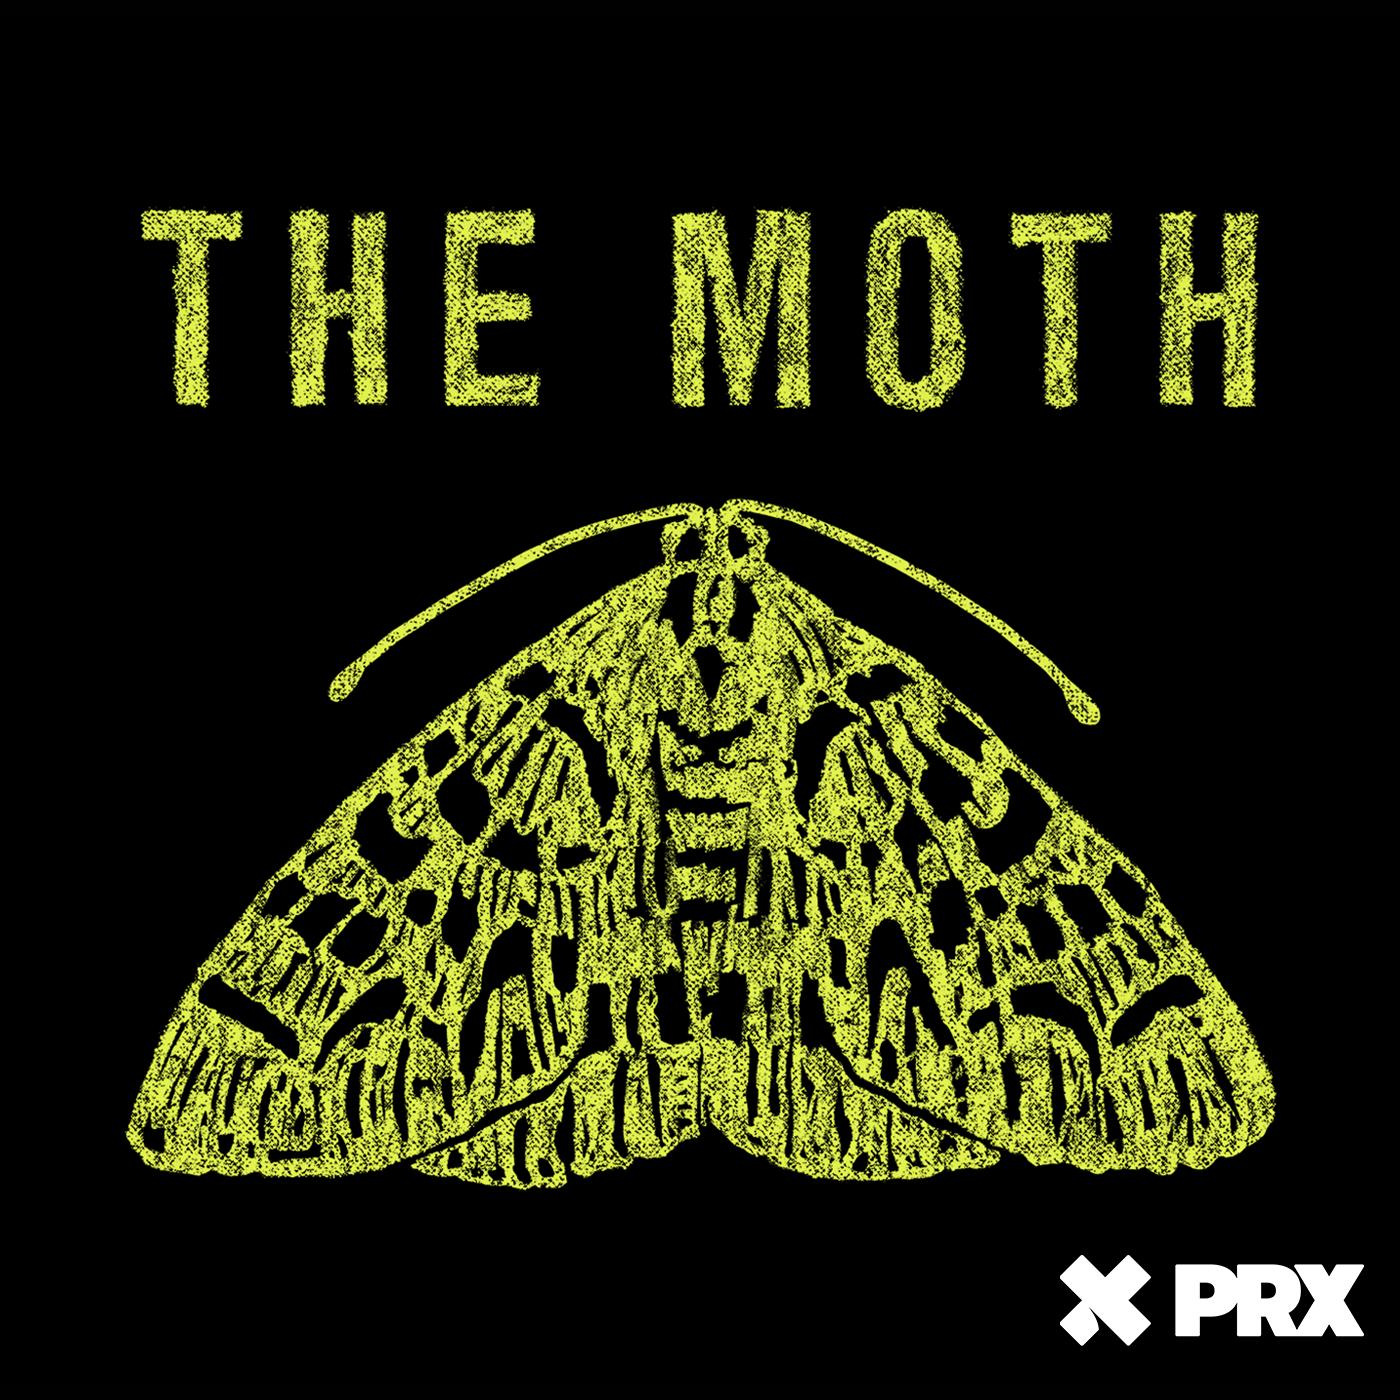 The Moth Radio Hour: The Future Looks Bright